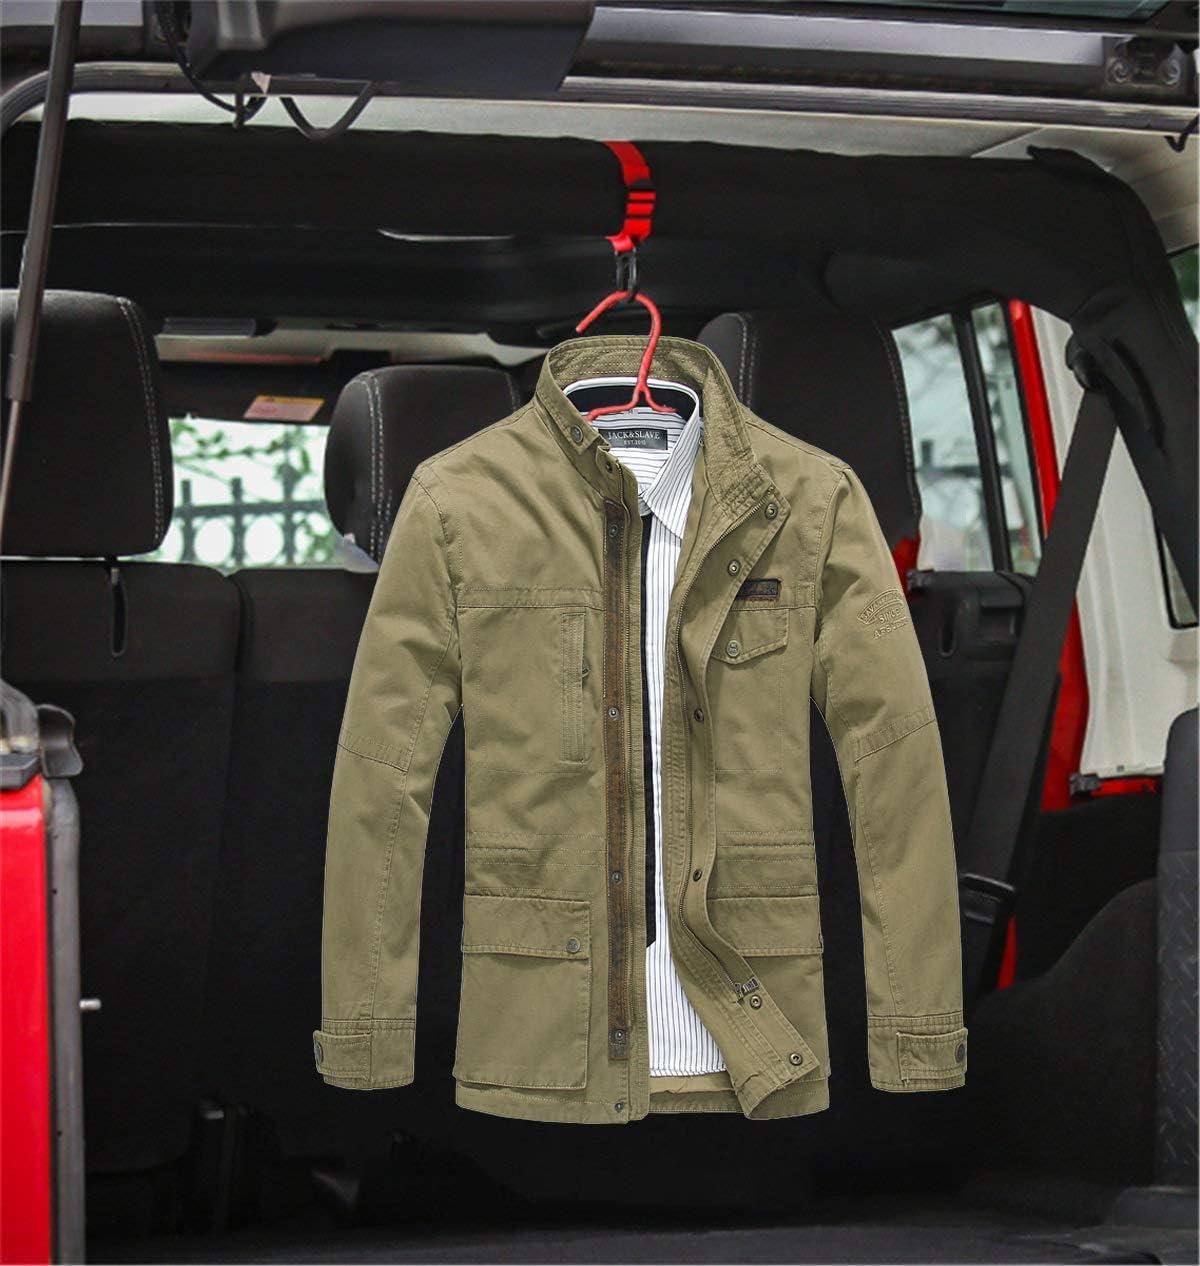 2PCS Roll Bar Coat Hanger Clothes Hook+2PCS Jeep Logo Car Back Seat Headrest Adjustable Hooks Accessories For Jeep Wrangler CJ YJ TJ LJ JK JKU JL JLU JT Sports Sahara Freedom Rubicon /& Unlimited-Red